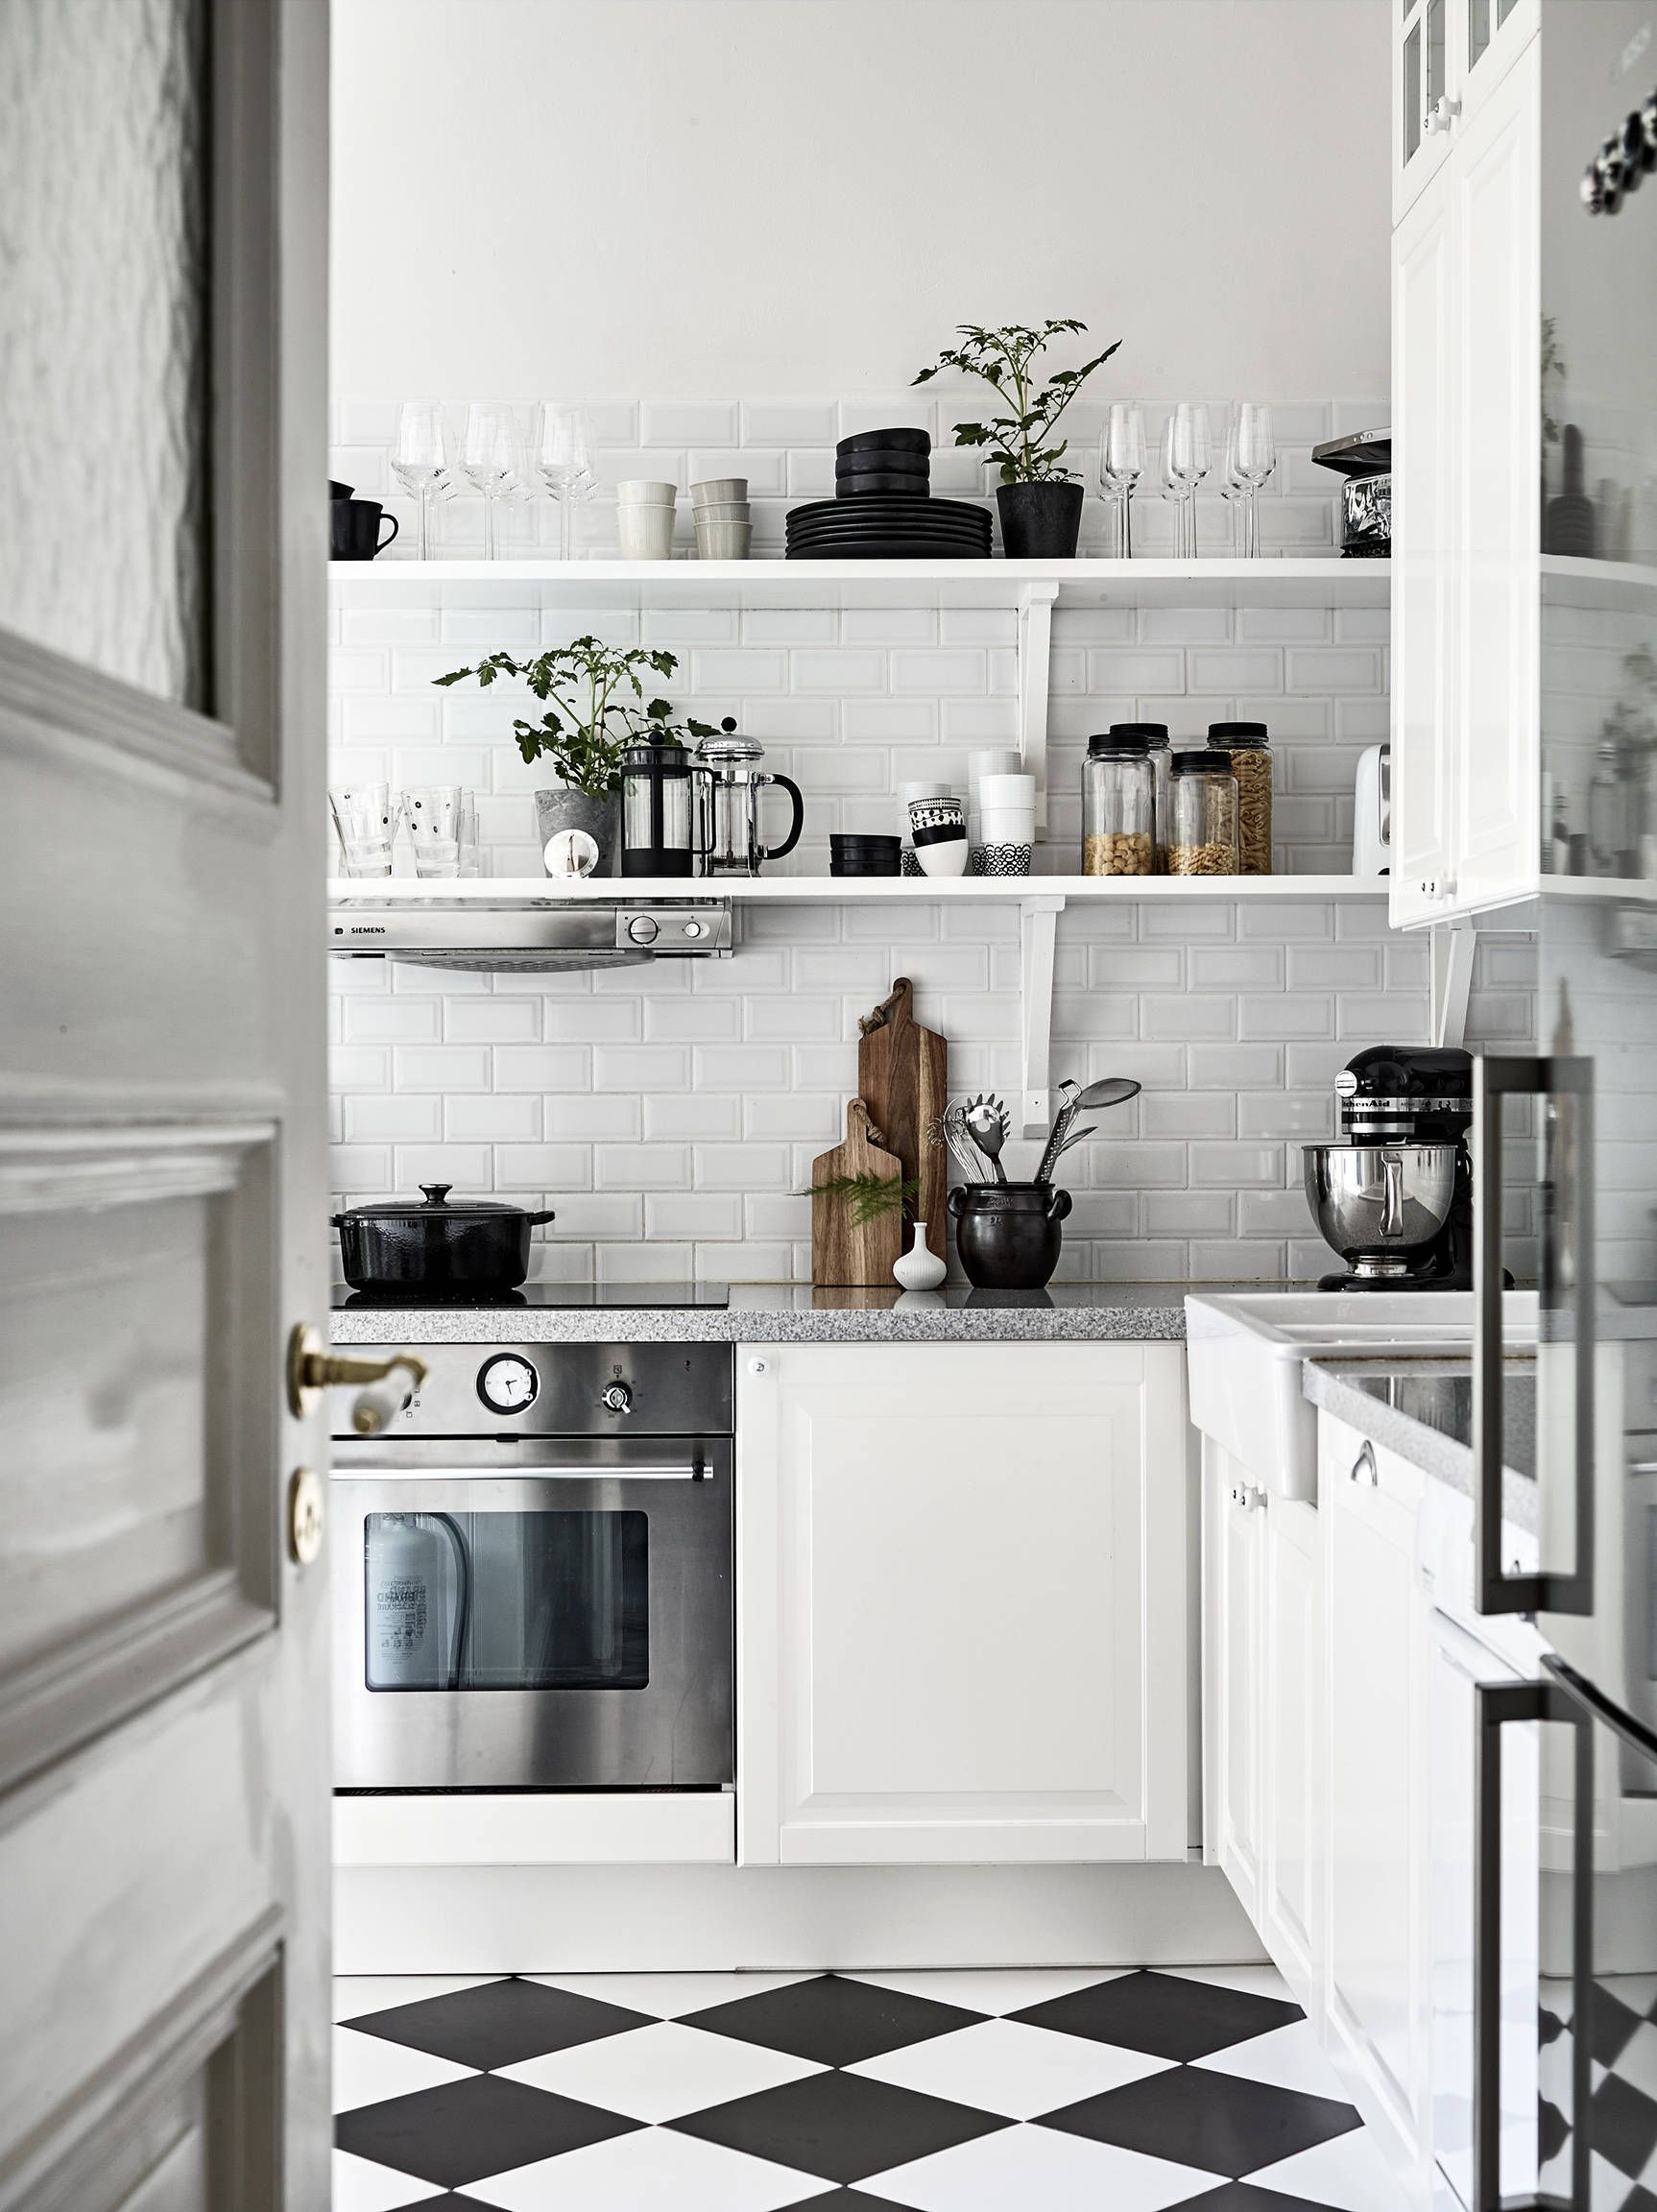 Pin By Dominika Tomczyk On Floor Kitchen Interior Kitchen